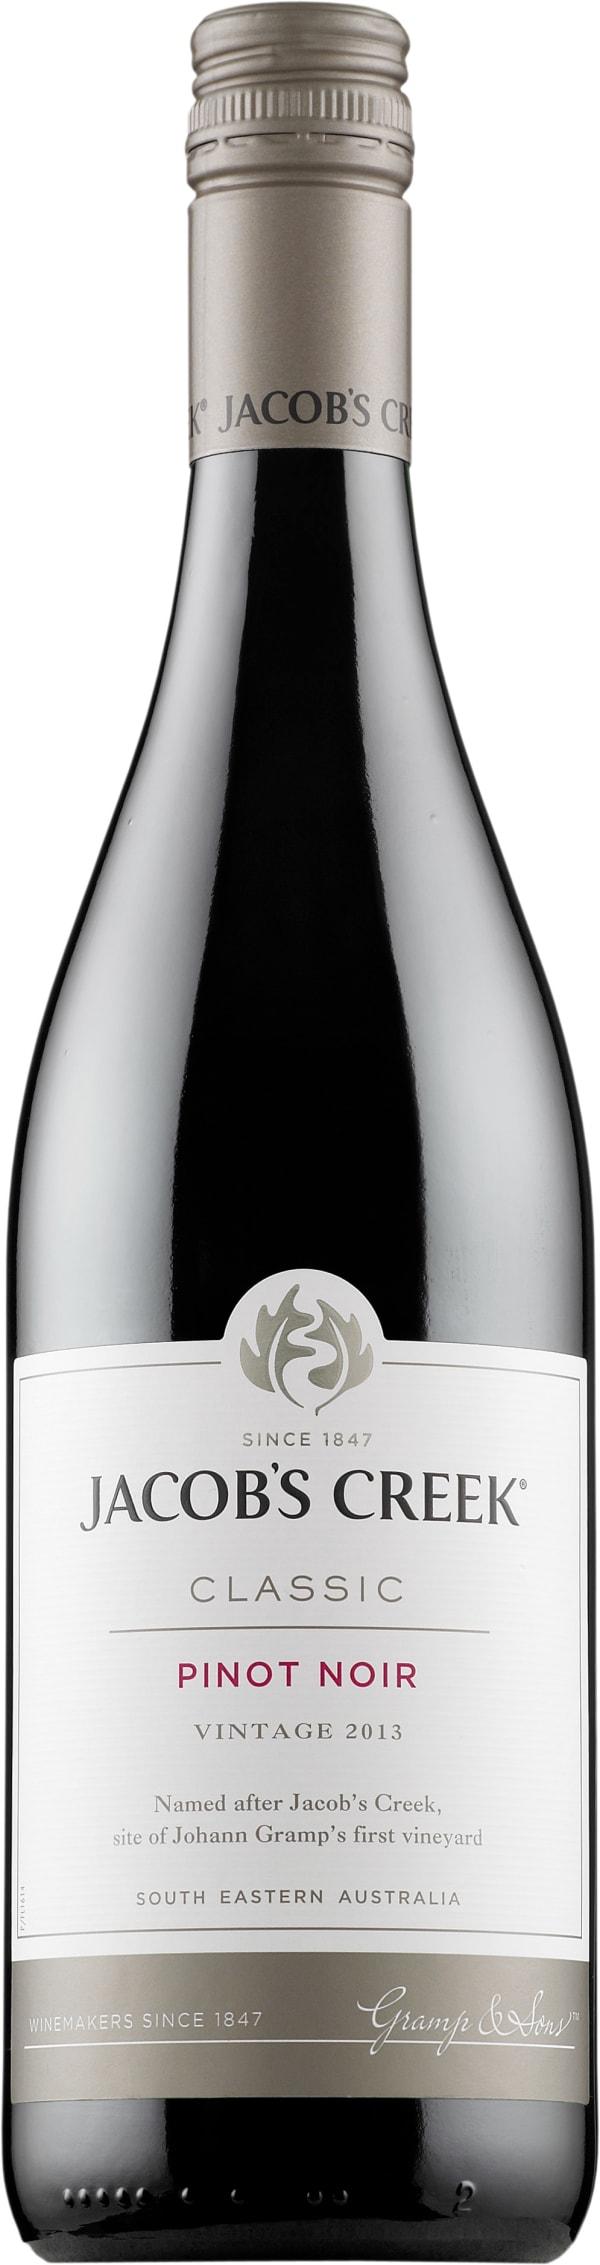 Jacob's Creek Pinot Noir 2018